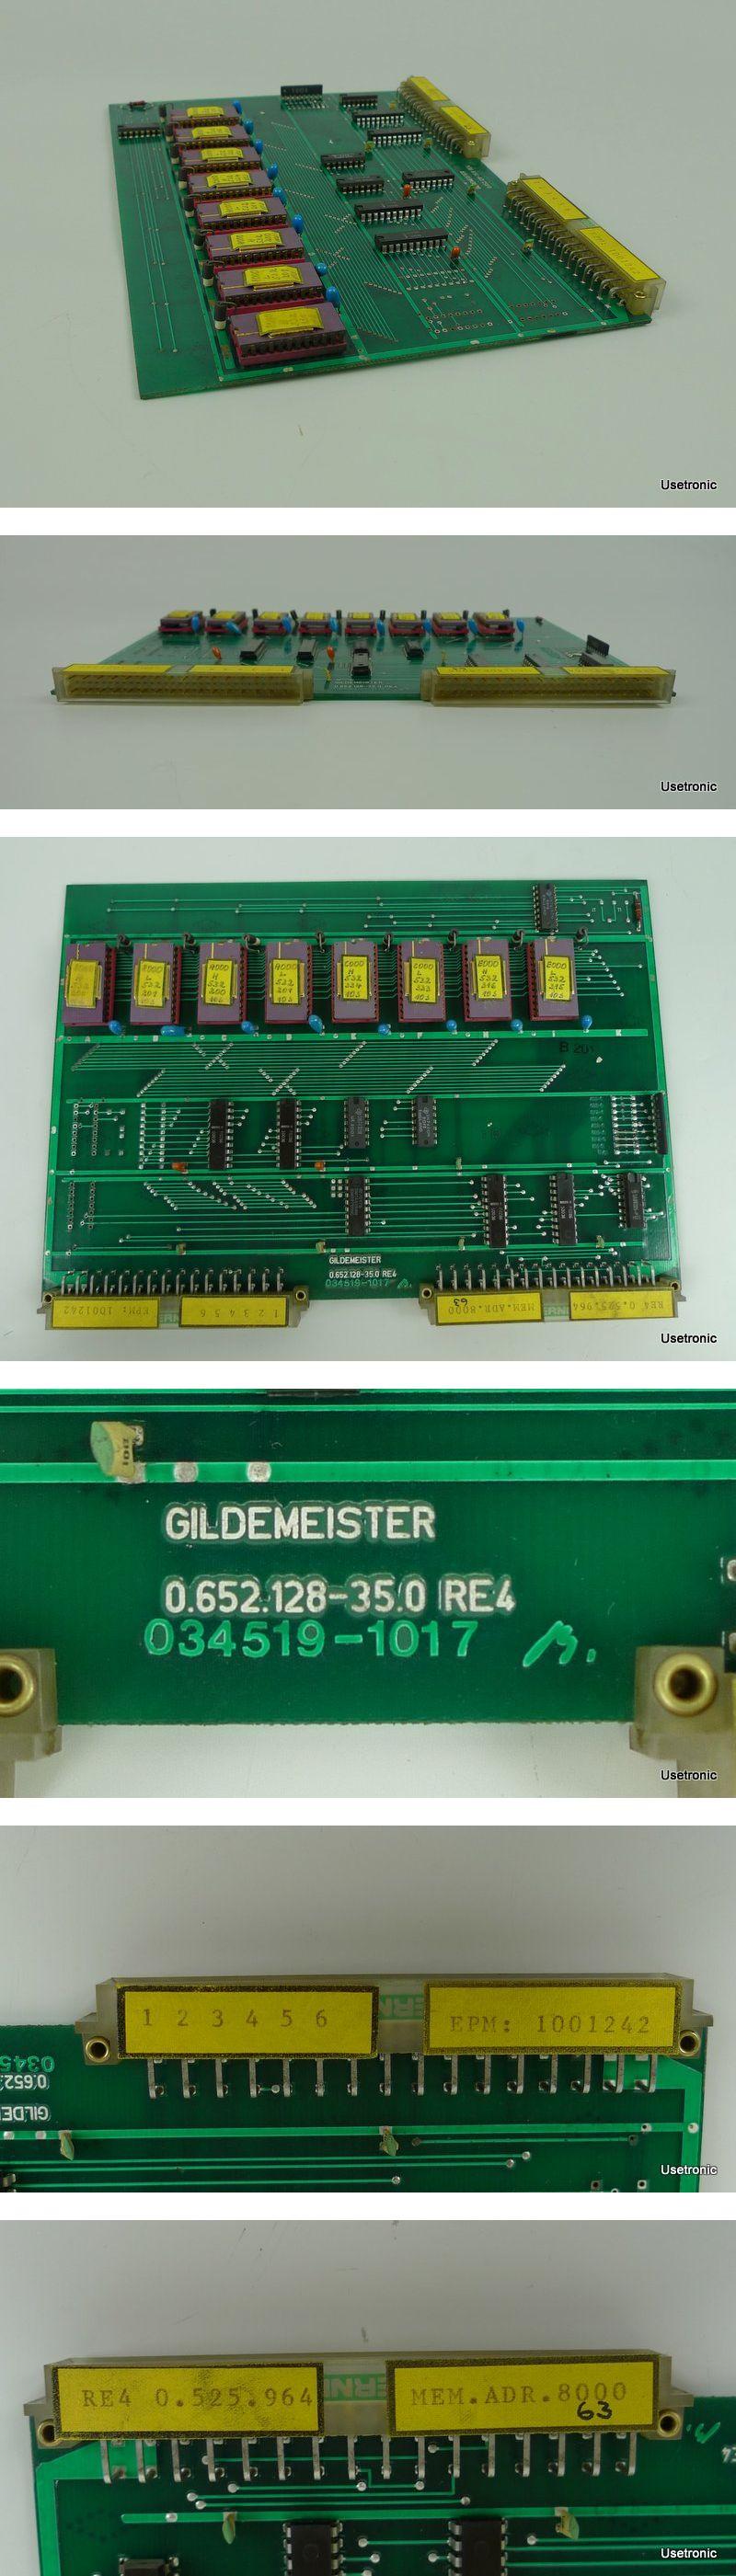 Gildemeister 0.652.128-35.0 RE4